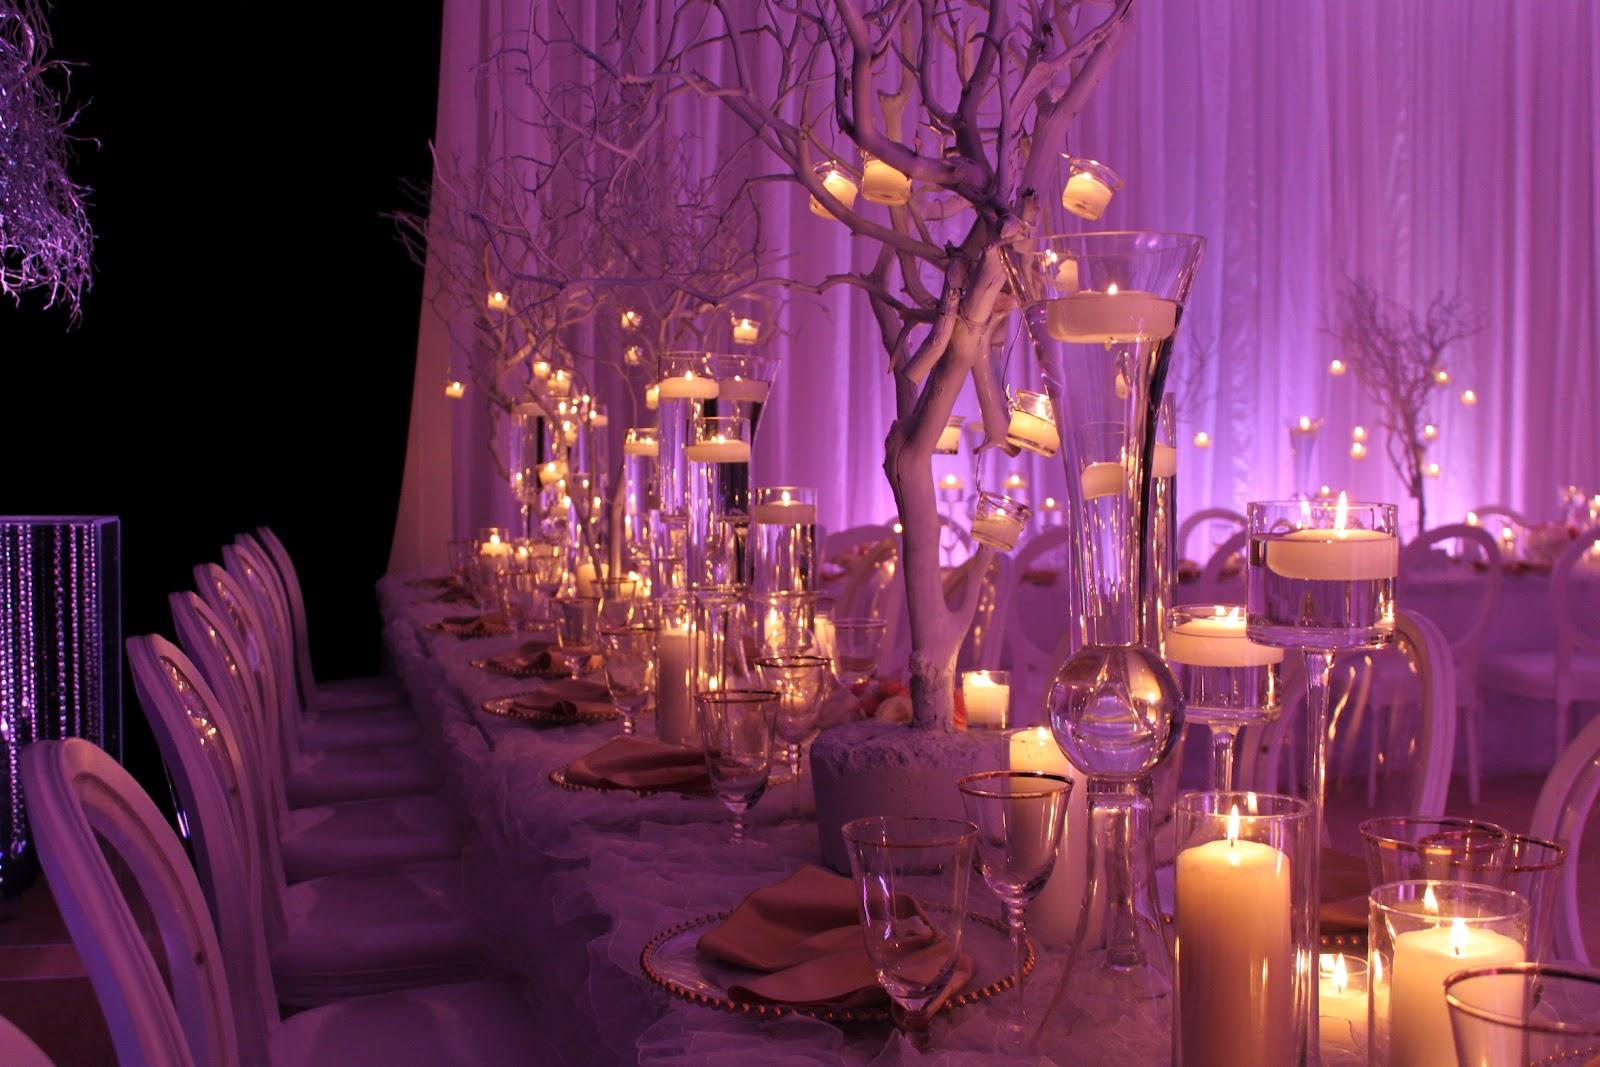 Decor flowers and lighting by us Davinci Florist